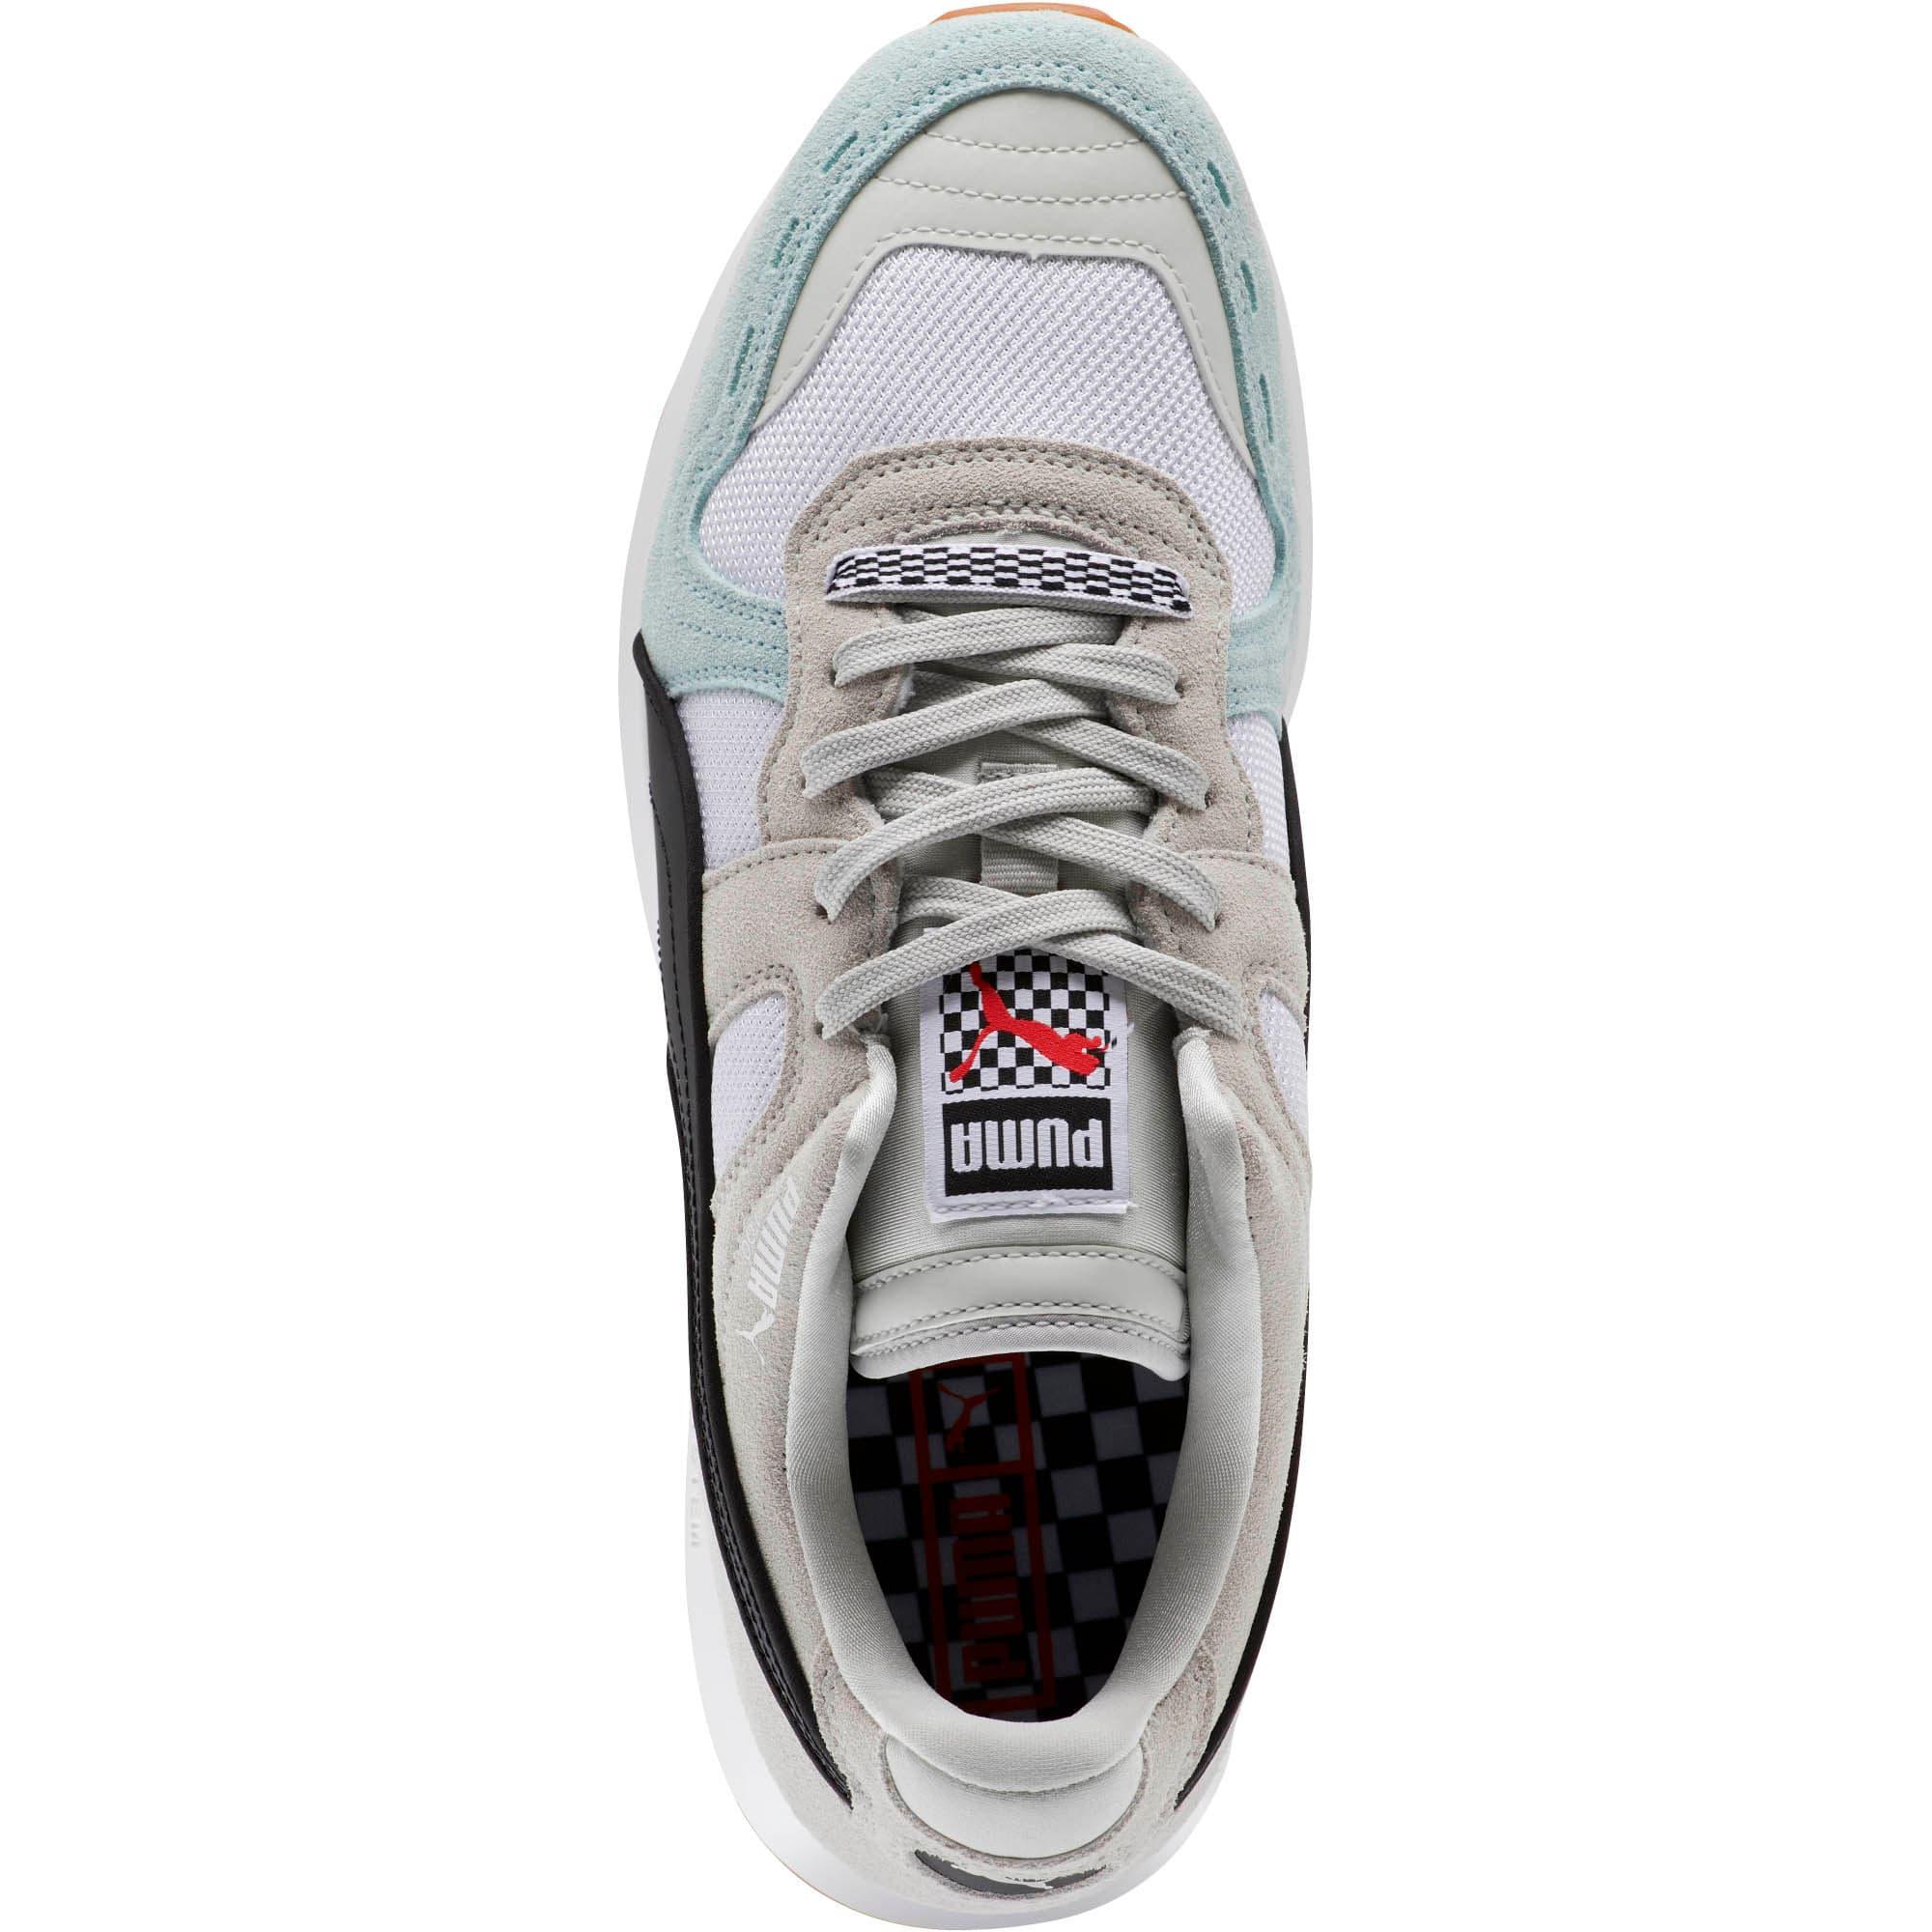 Miniatura 5 de Zapatos deportivos RS-100 Racing Flag, Glacier Gray-Puma White, mediano